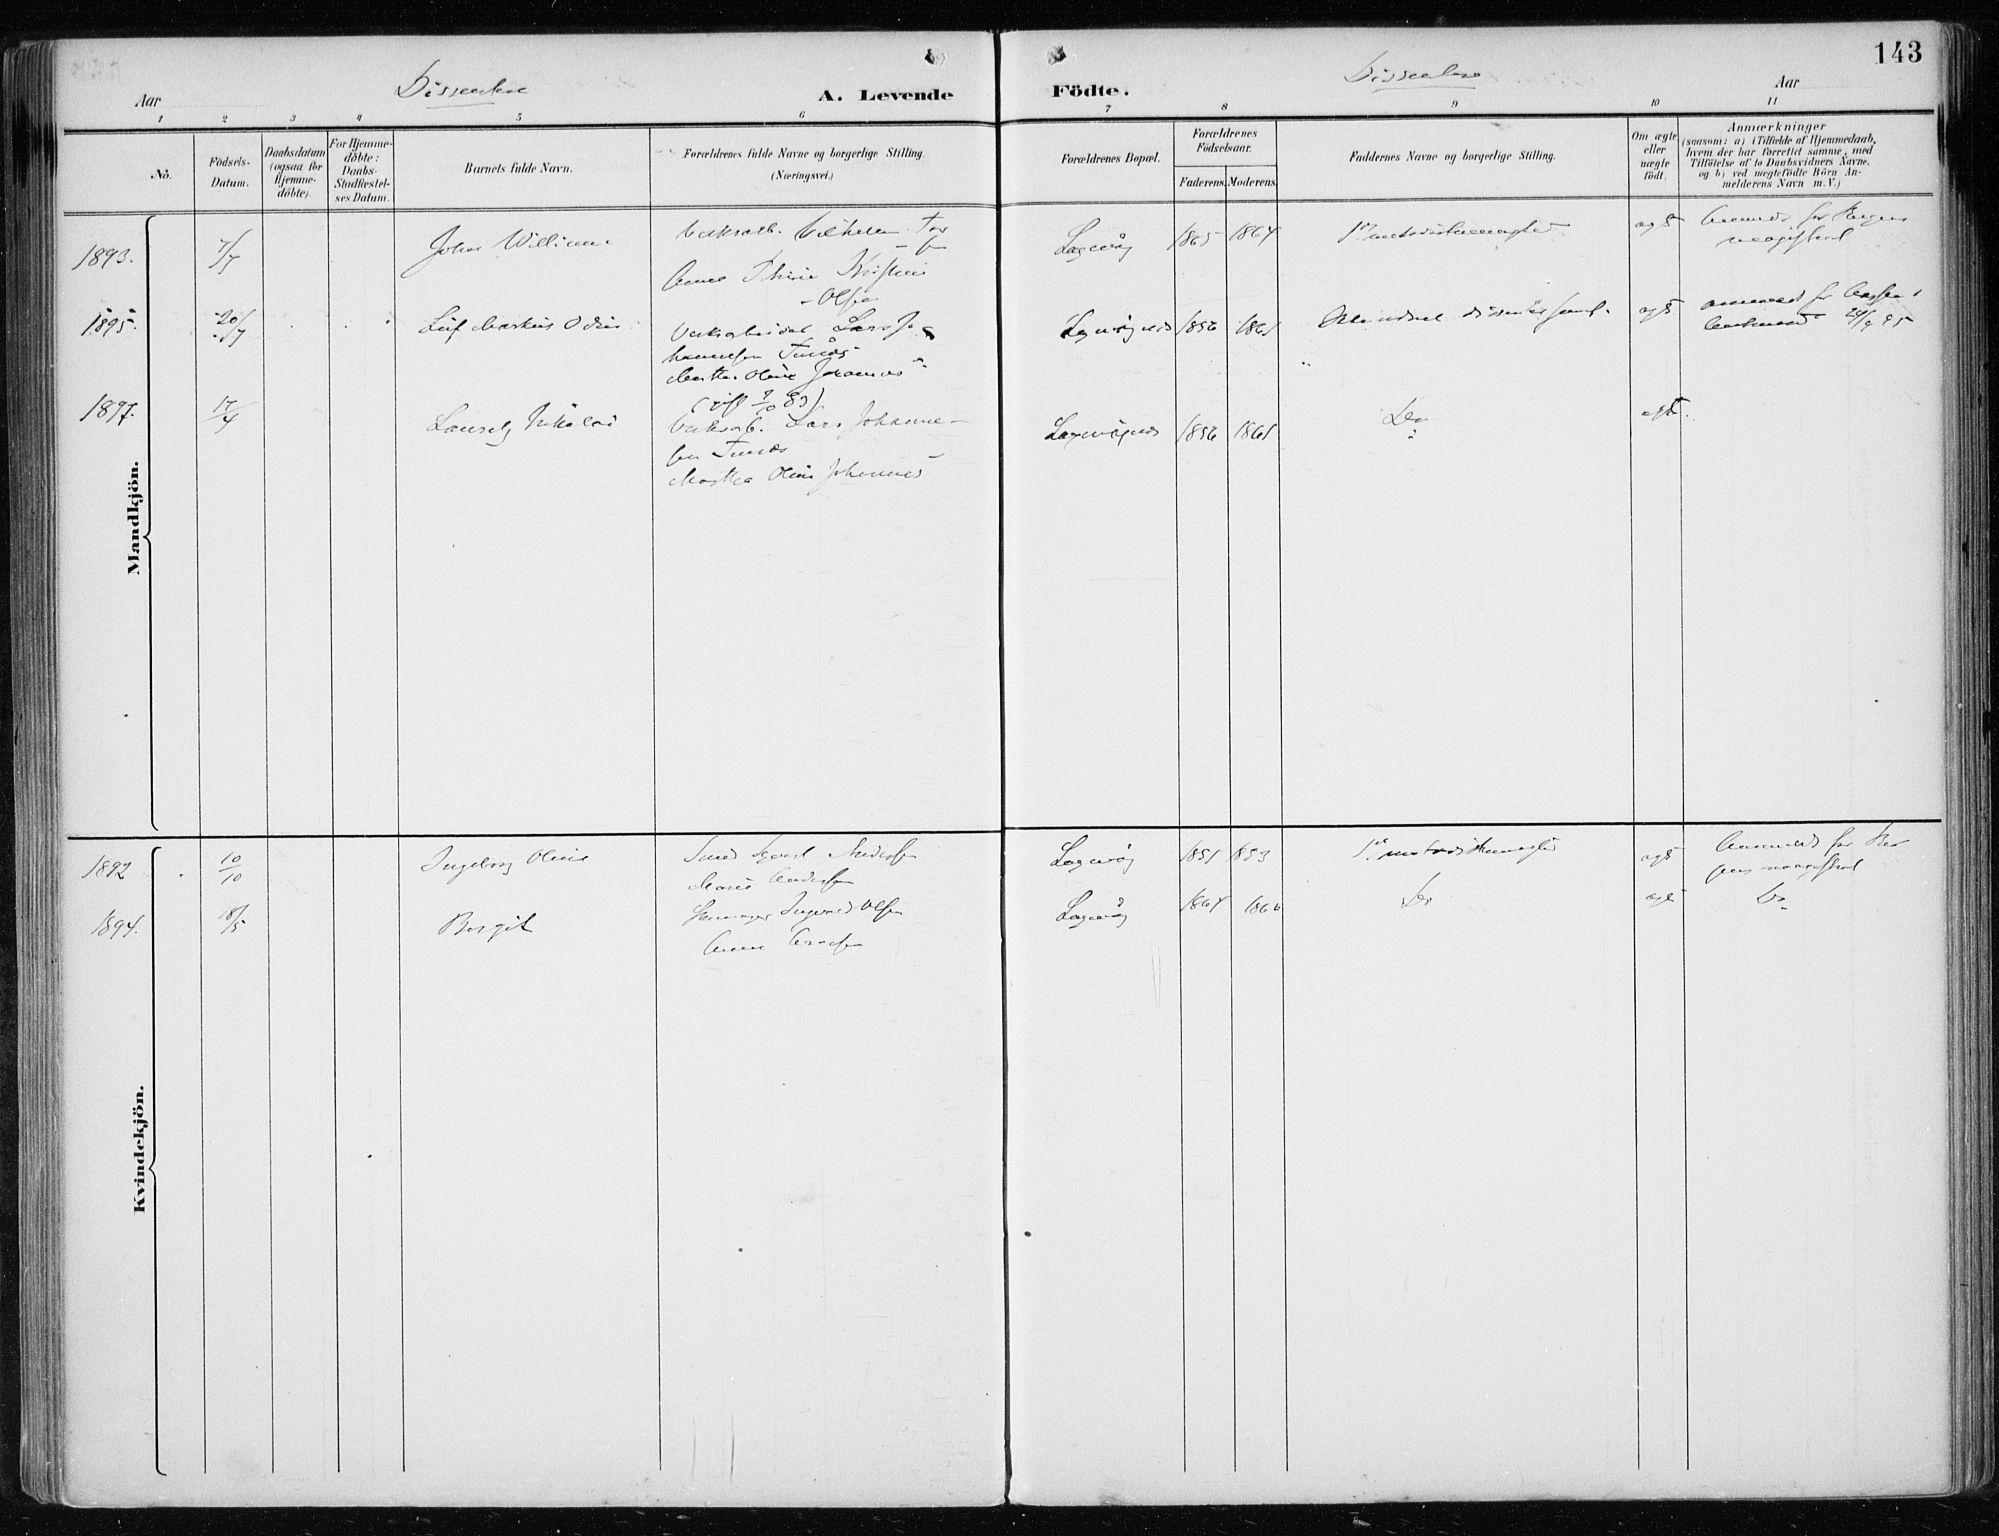 SAB, Laksevåg Sokneprestembete, H/Haa: Ministerialbok nr. A 3, 1891-1903, s. 143